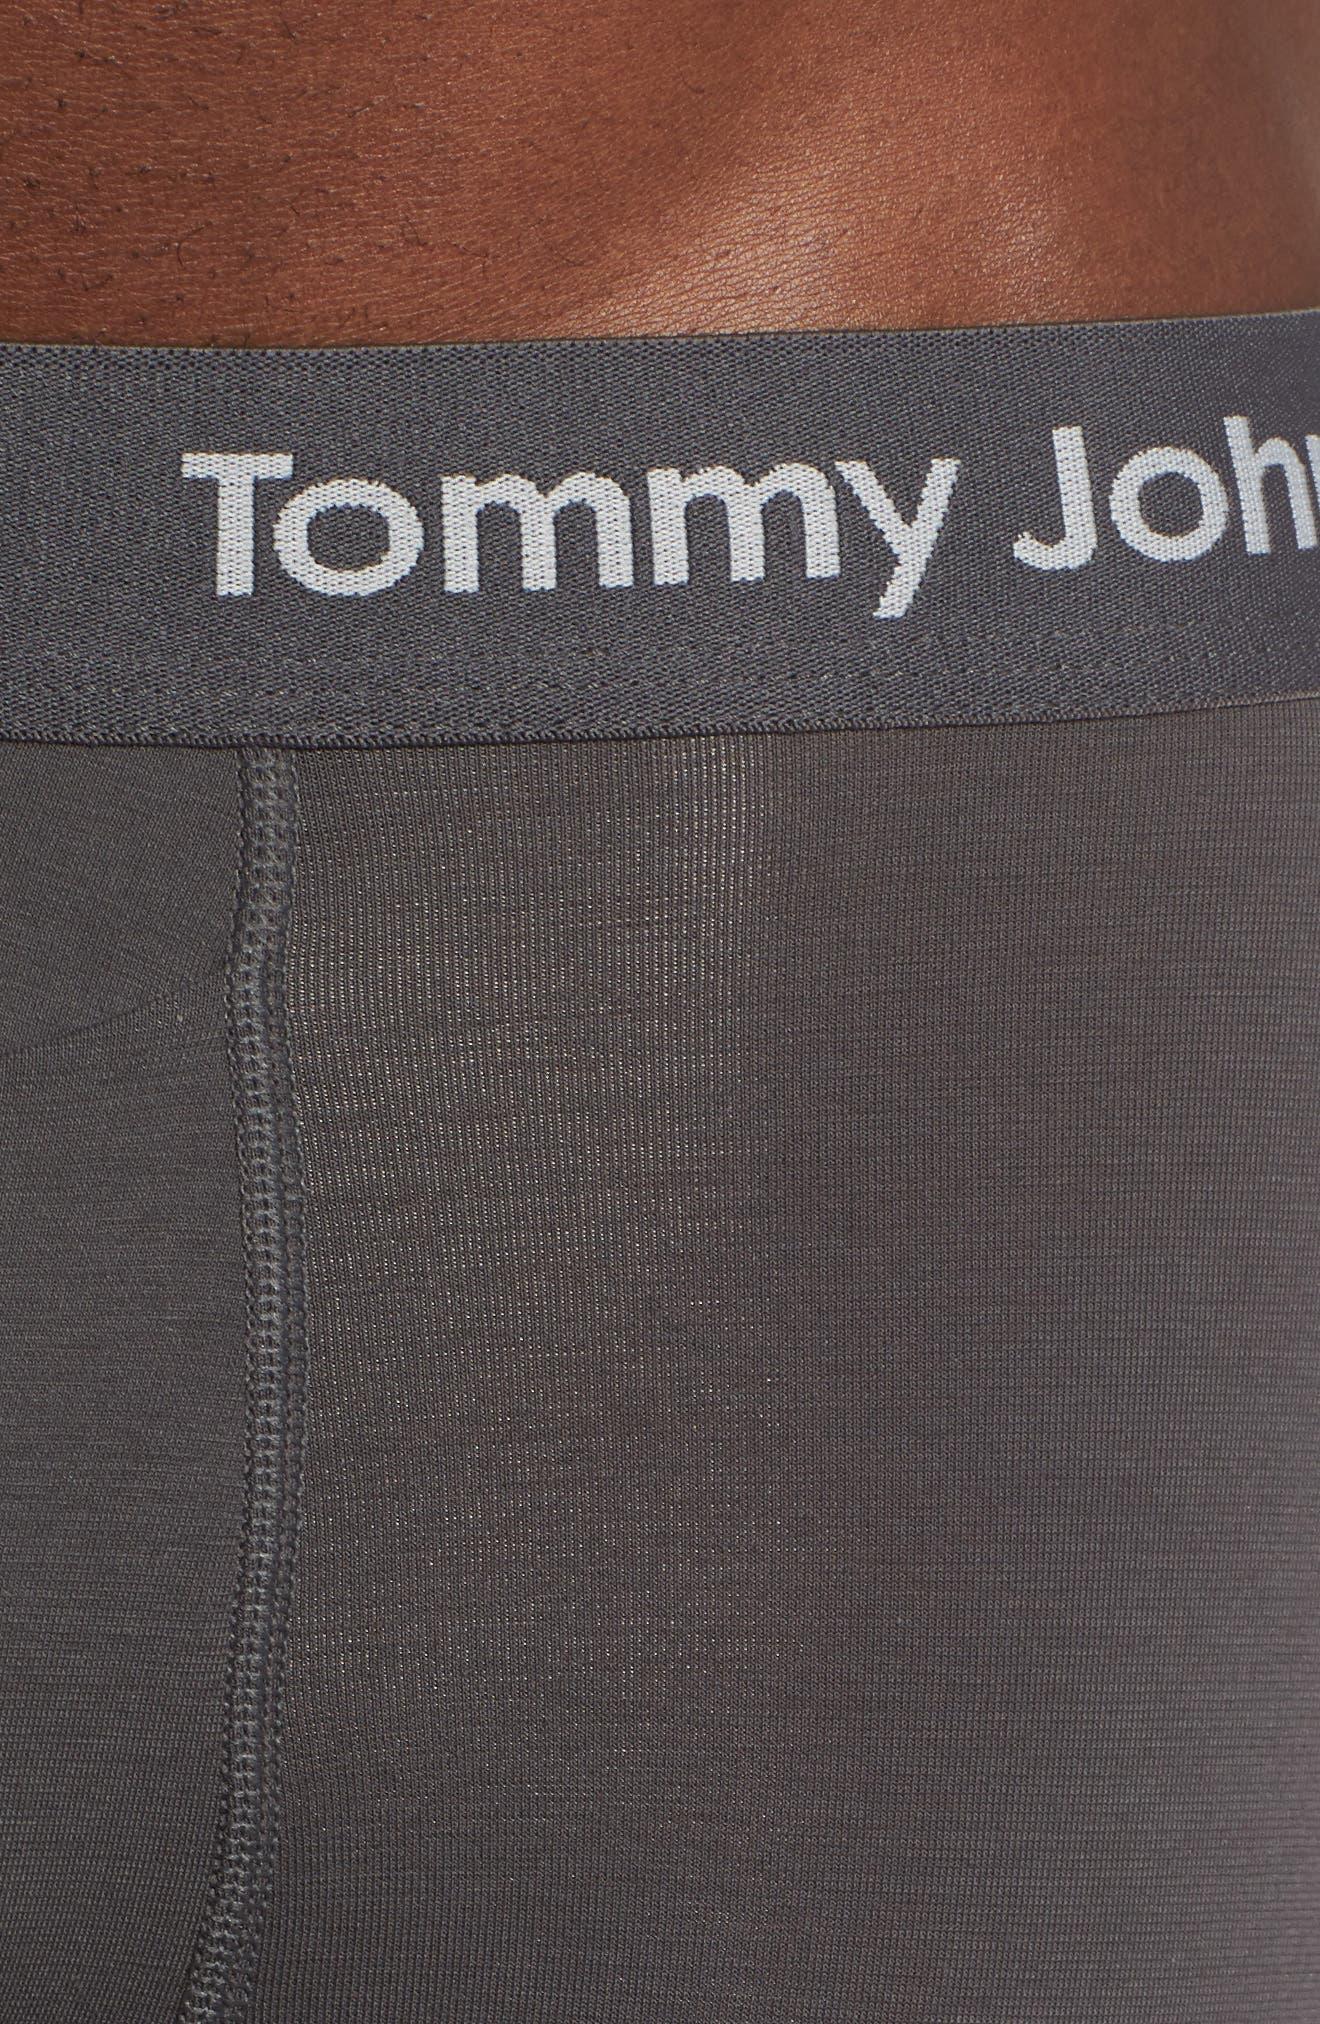 Alternate Image 4  - Tommy John Cool Cotton Trunks